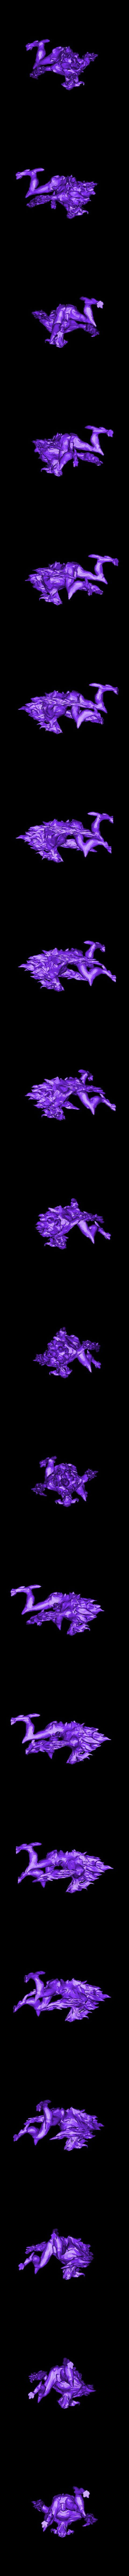 FireElemental.stl Download free STL file Gloomhaven Flame Demon • 3D printable design, Gronis